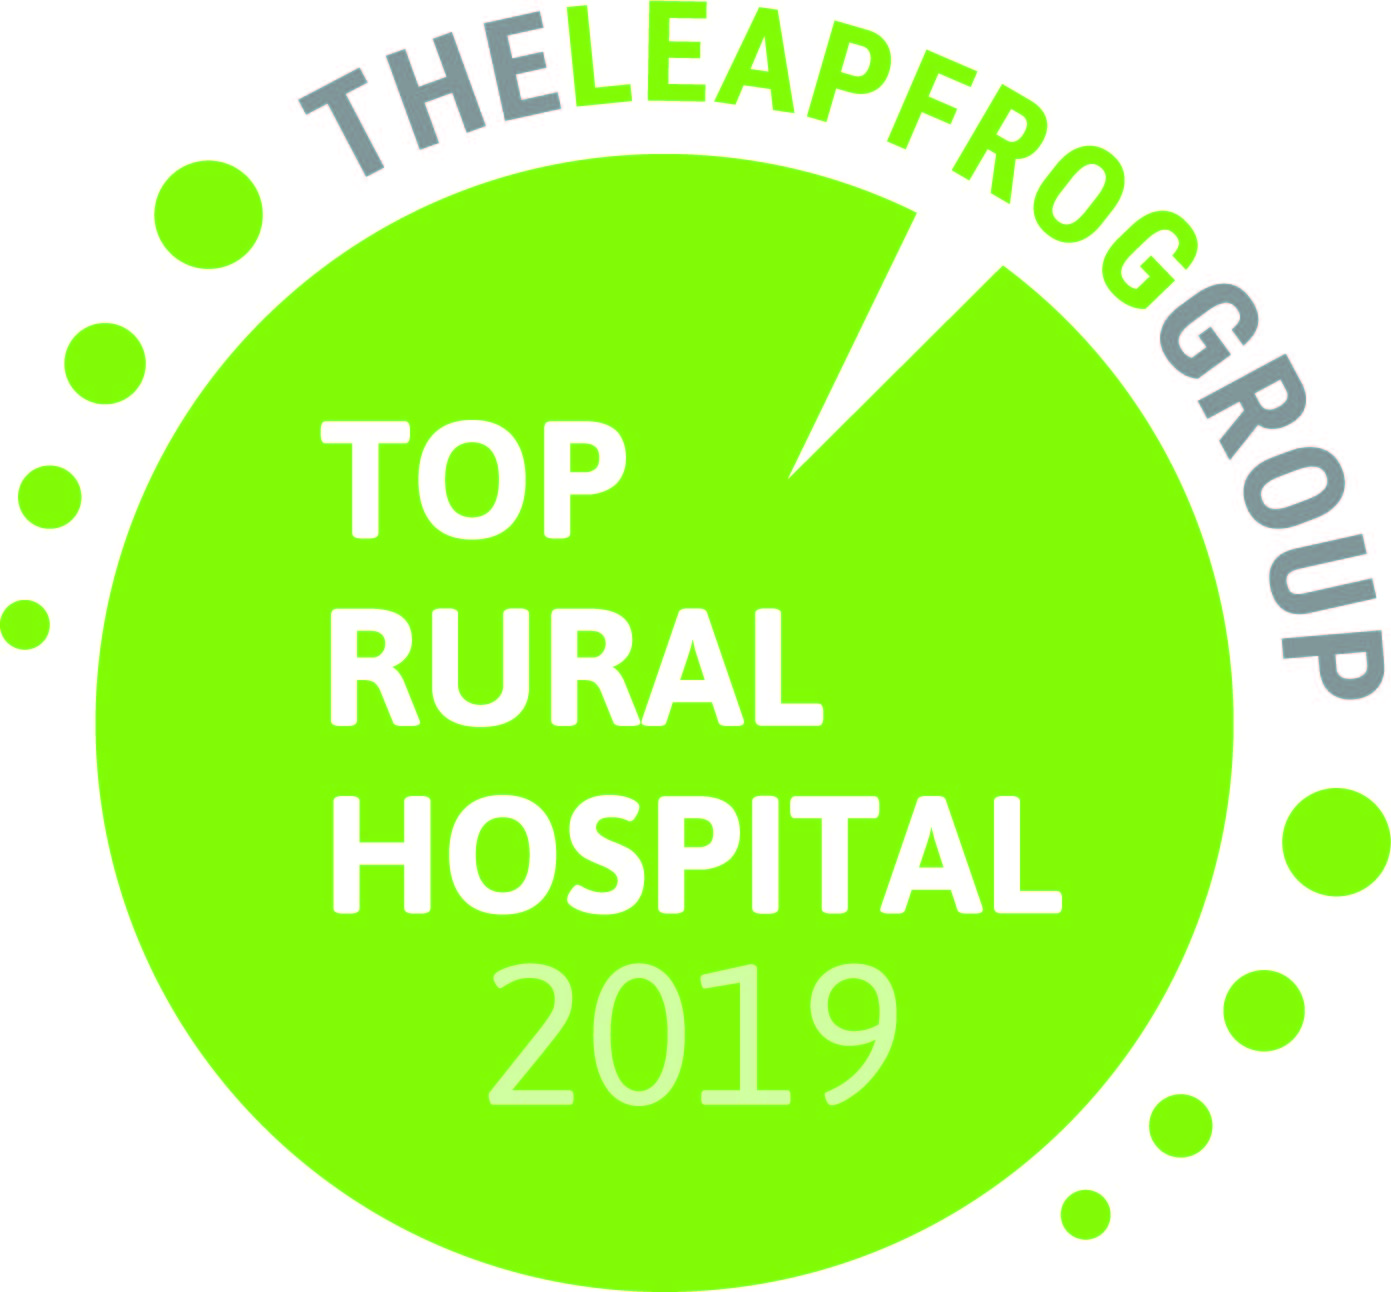 top-rural-hospital-logo 2019-print